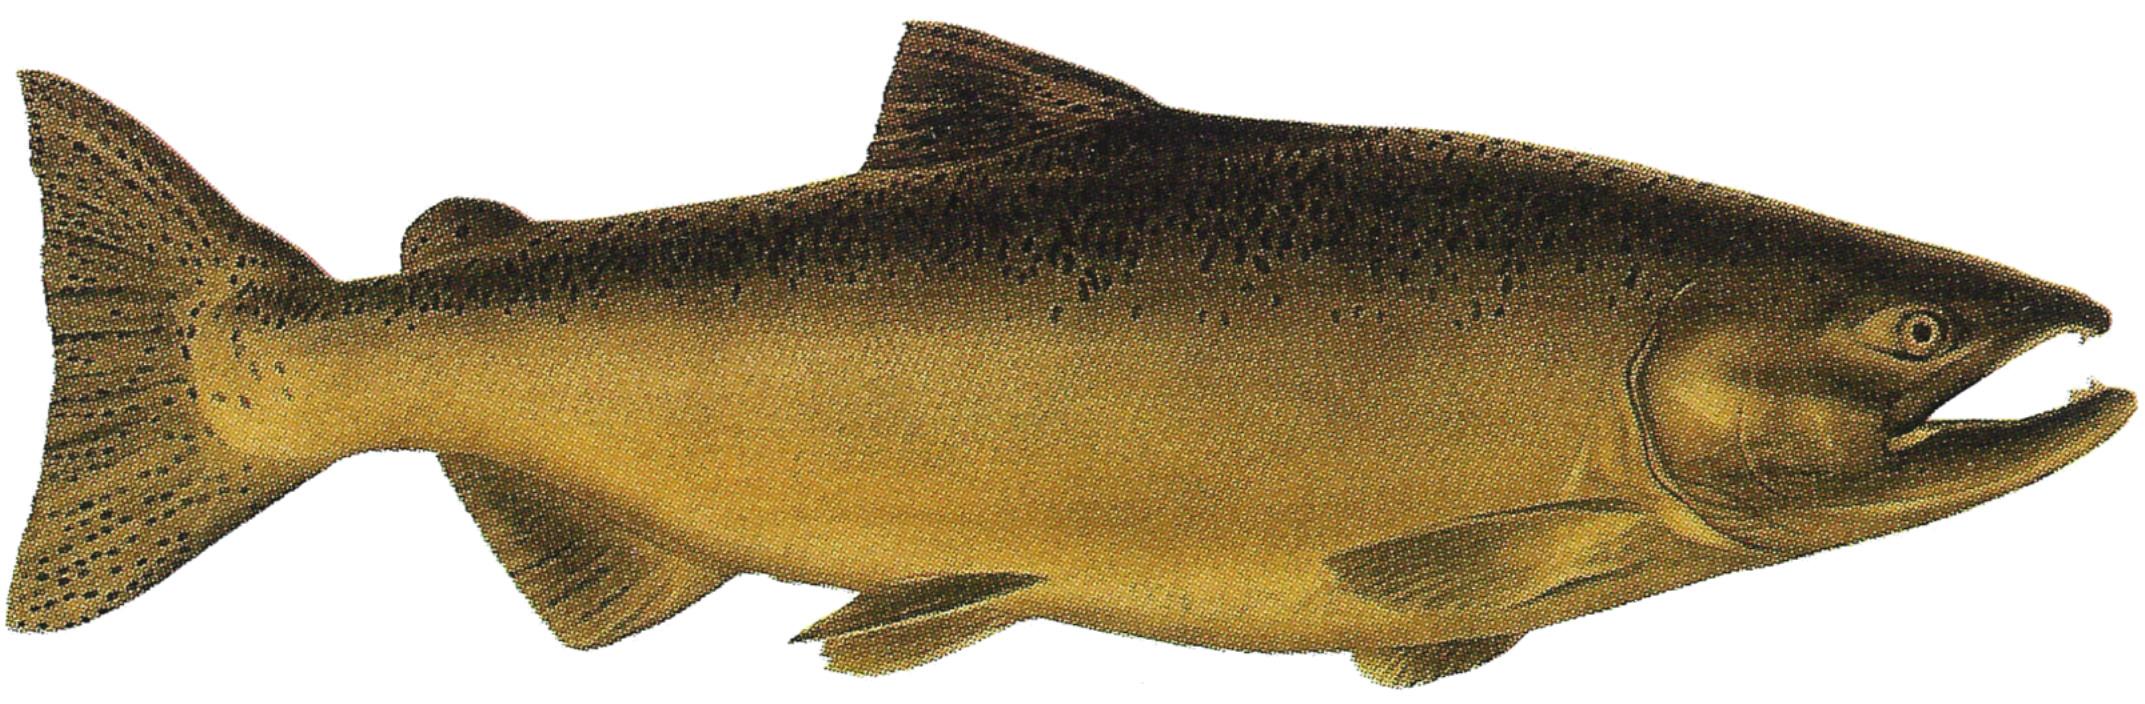 2145x704 Chinook Salmon